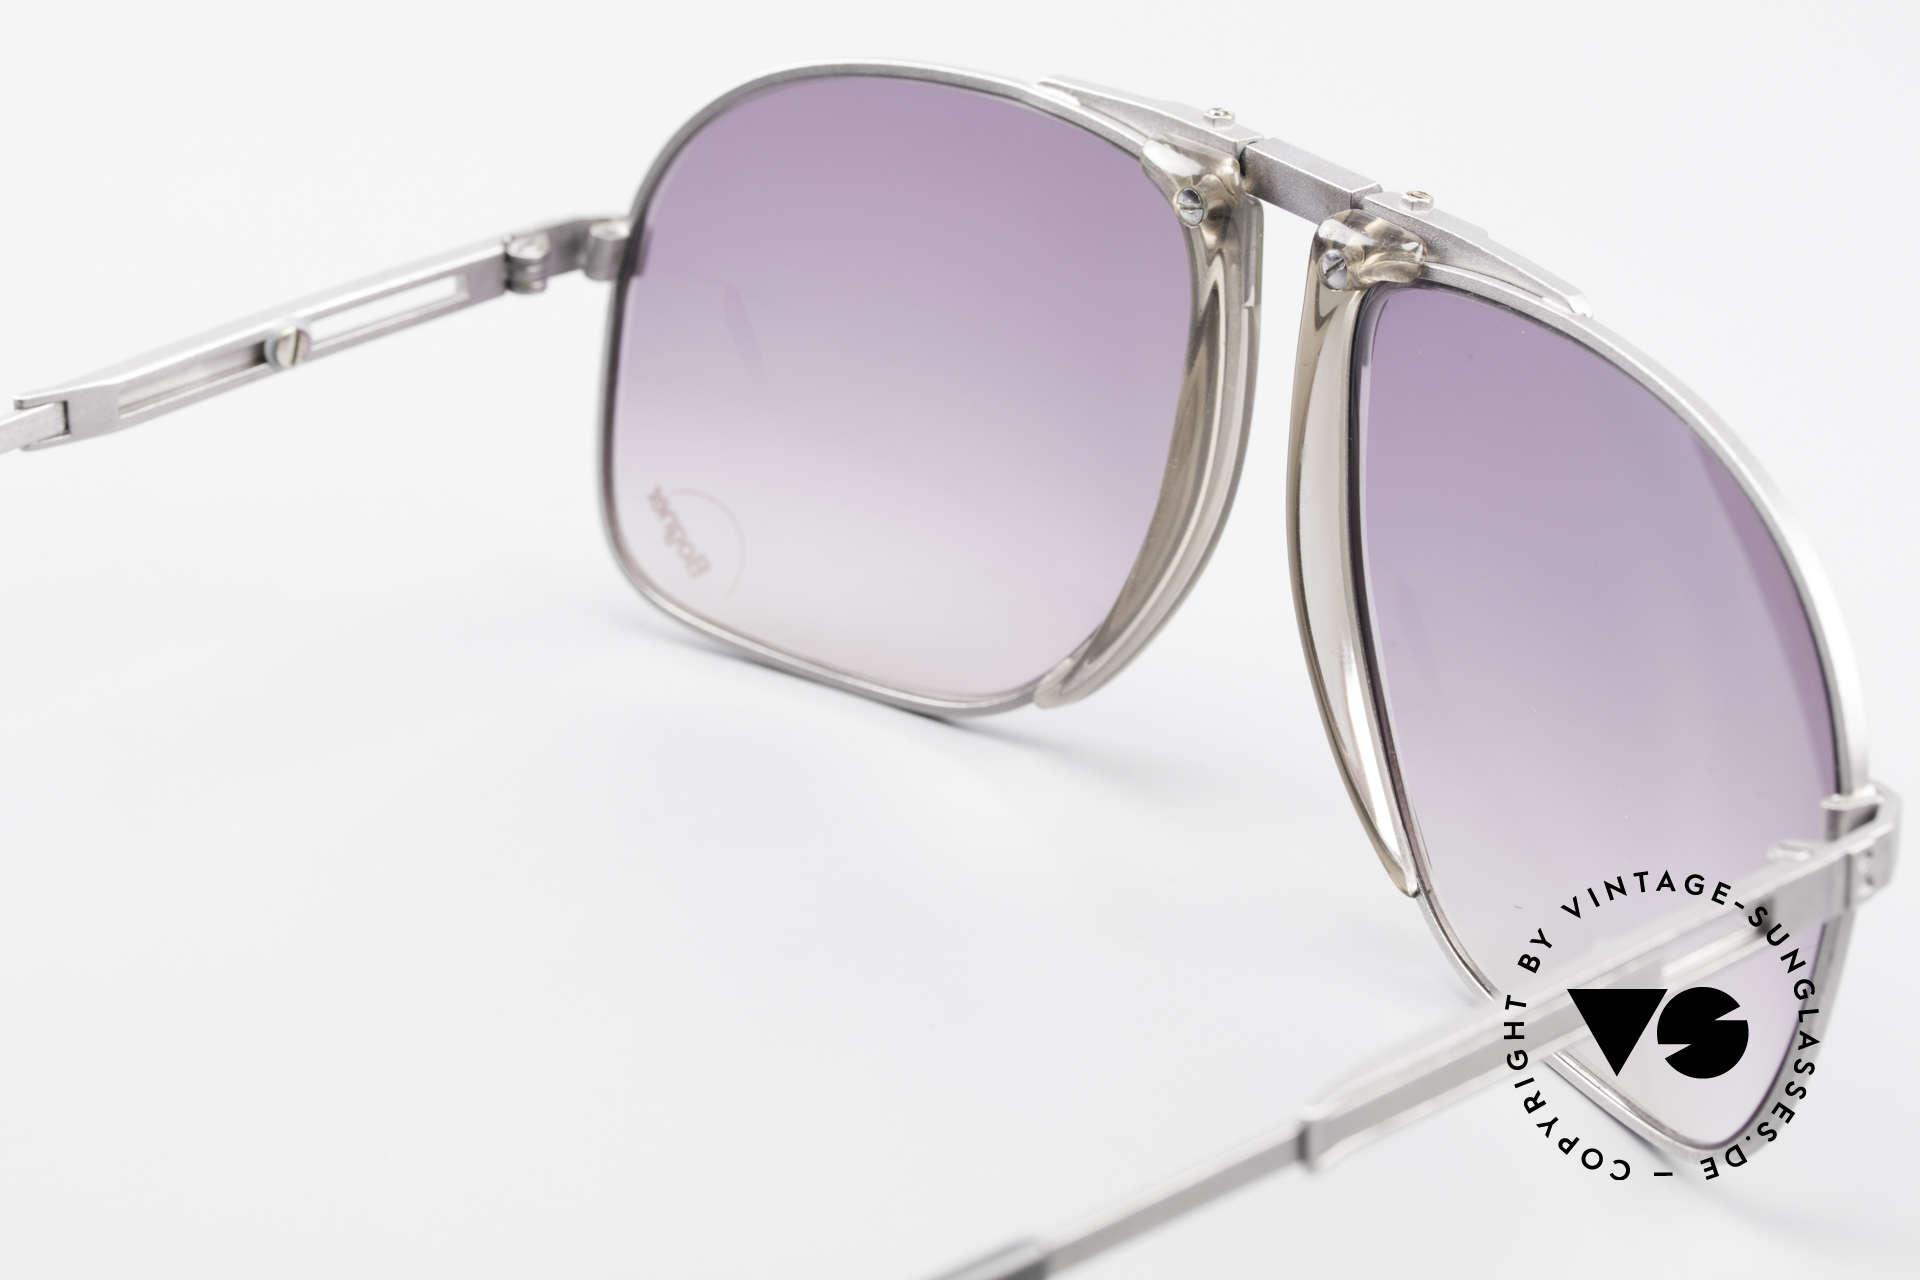 Willy Bogner 7023 Adjustable Sunglasses 80's, NO RETRO, but a rare 80's ORIGINAL (+ case by Bogner), Made for Men